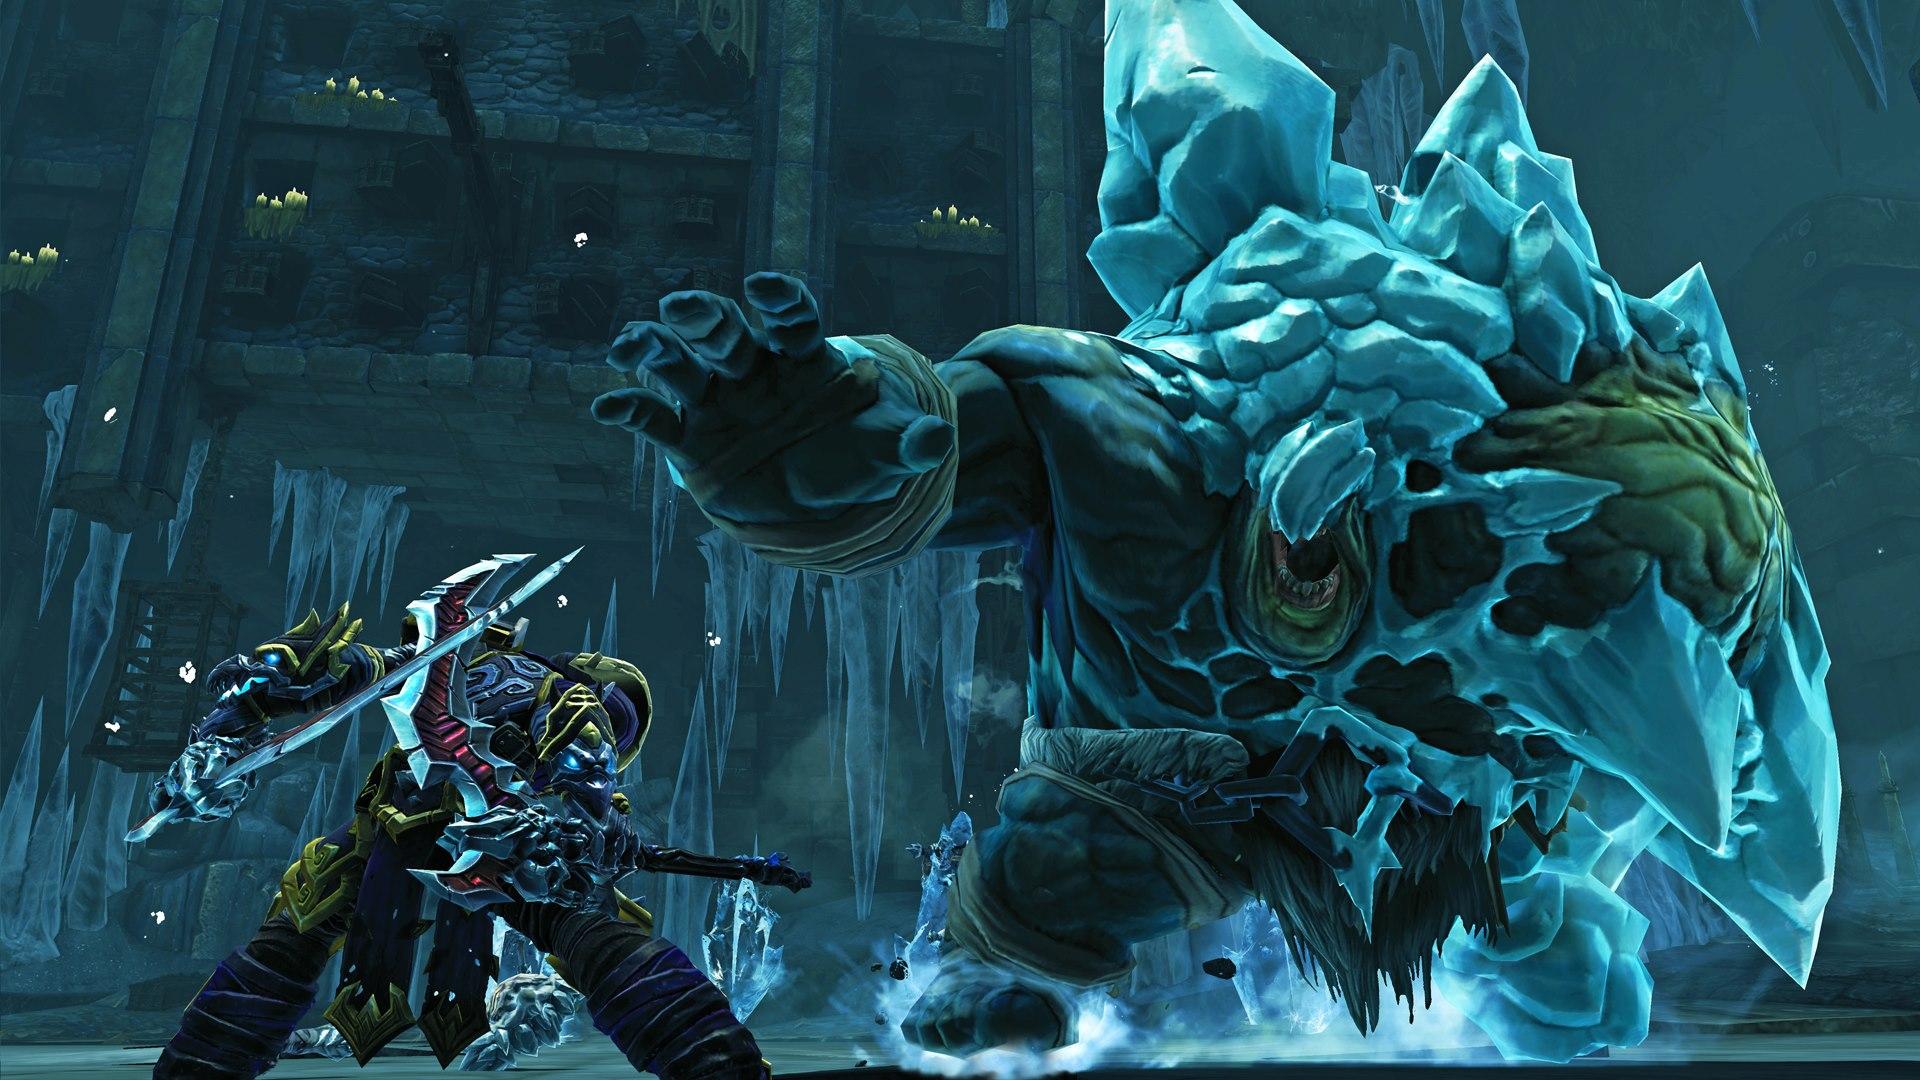 Darksiders II: Argul's Tomb | Darksiders Wiki | FANDOM powered by Wikia